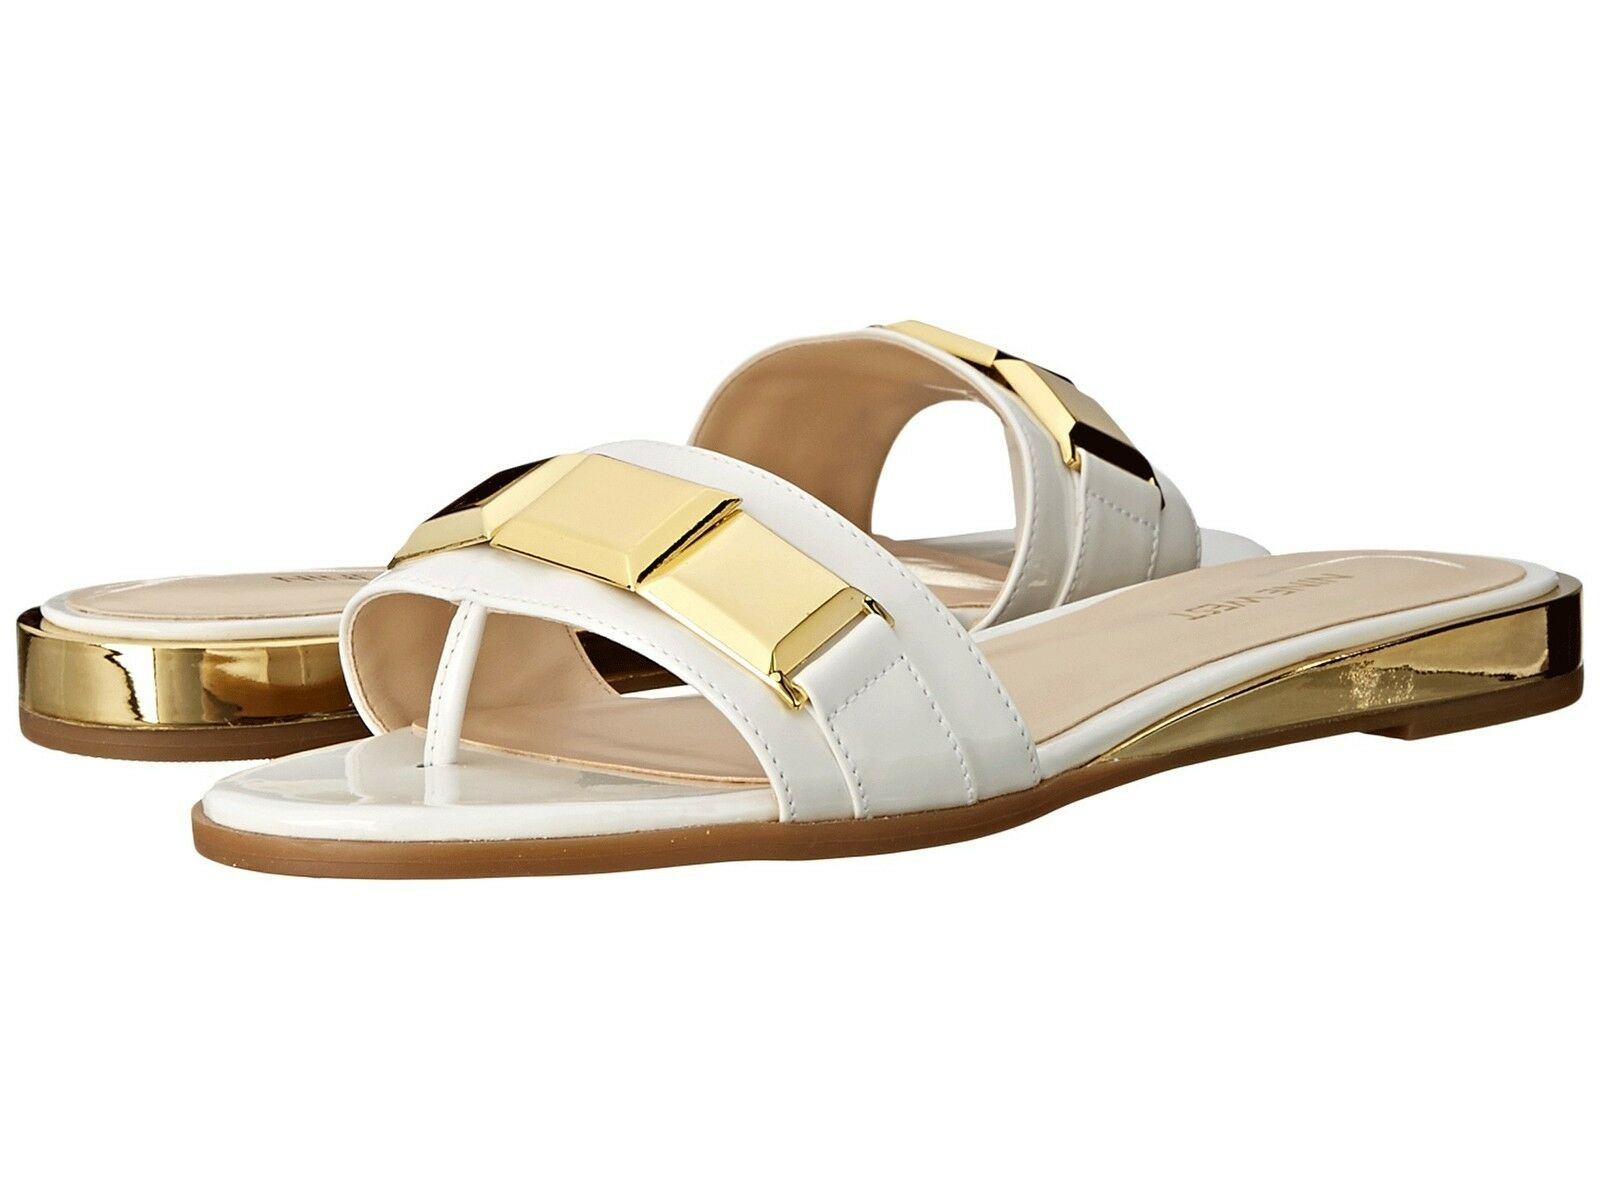 Nine West Xtina White Synthetic Sandals Women Size 6.5 M